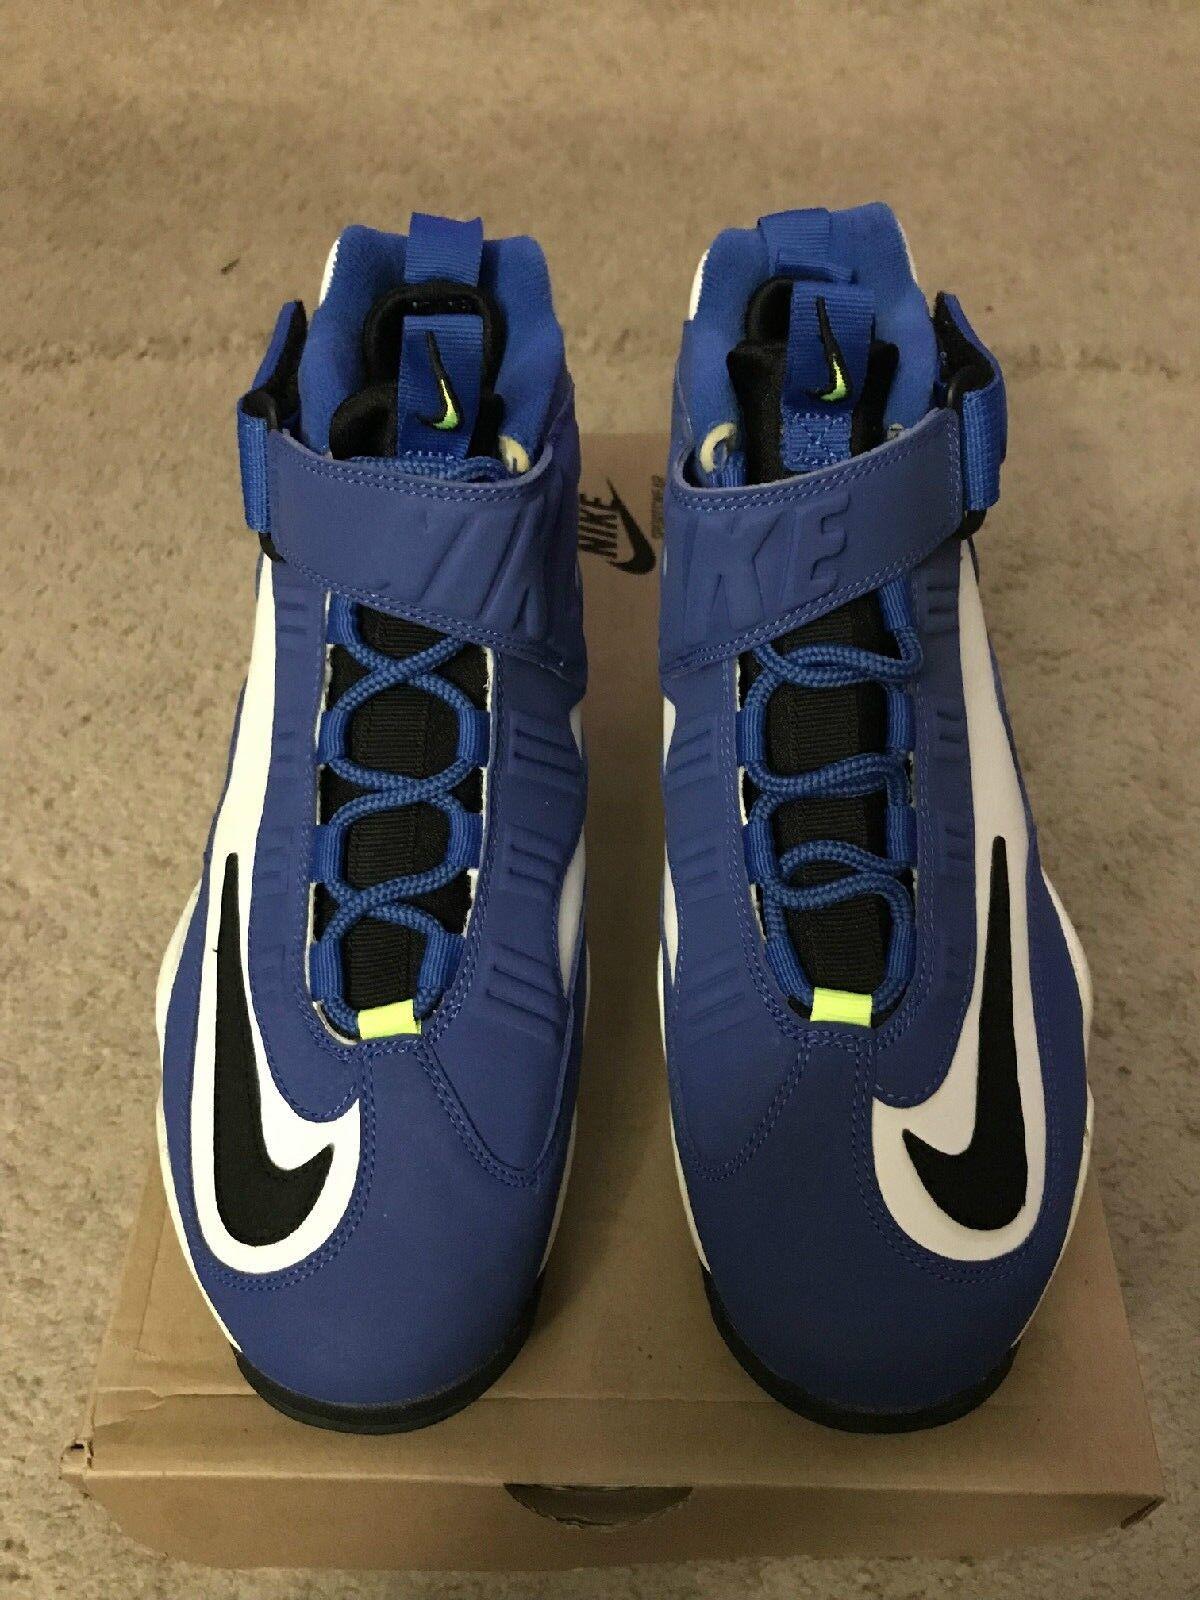 Men's Nike Air Griffey Max 1 354912-411   Size 8 NEW  354912-411 2009 30bdd3